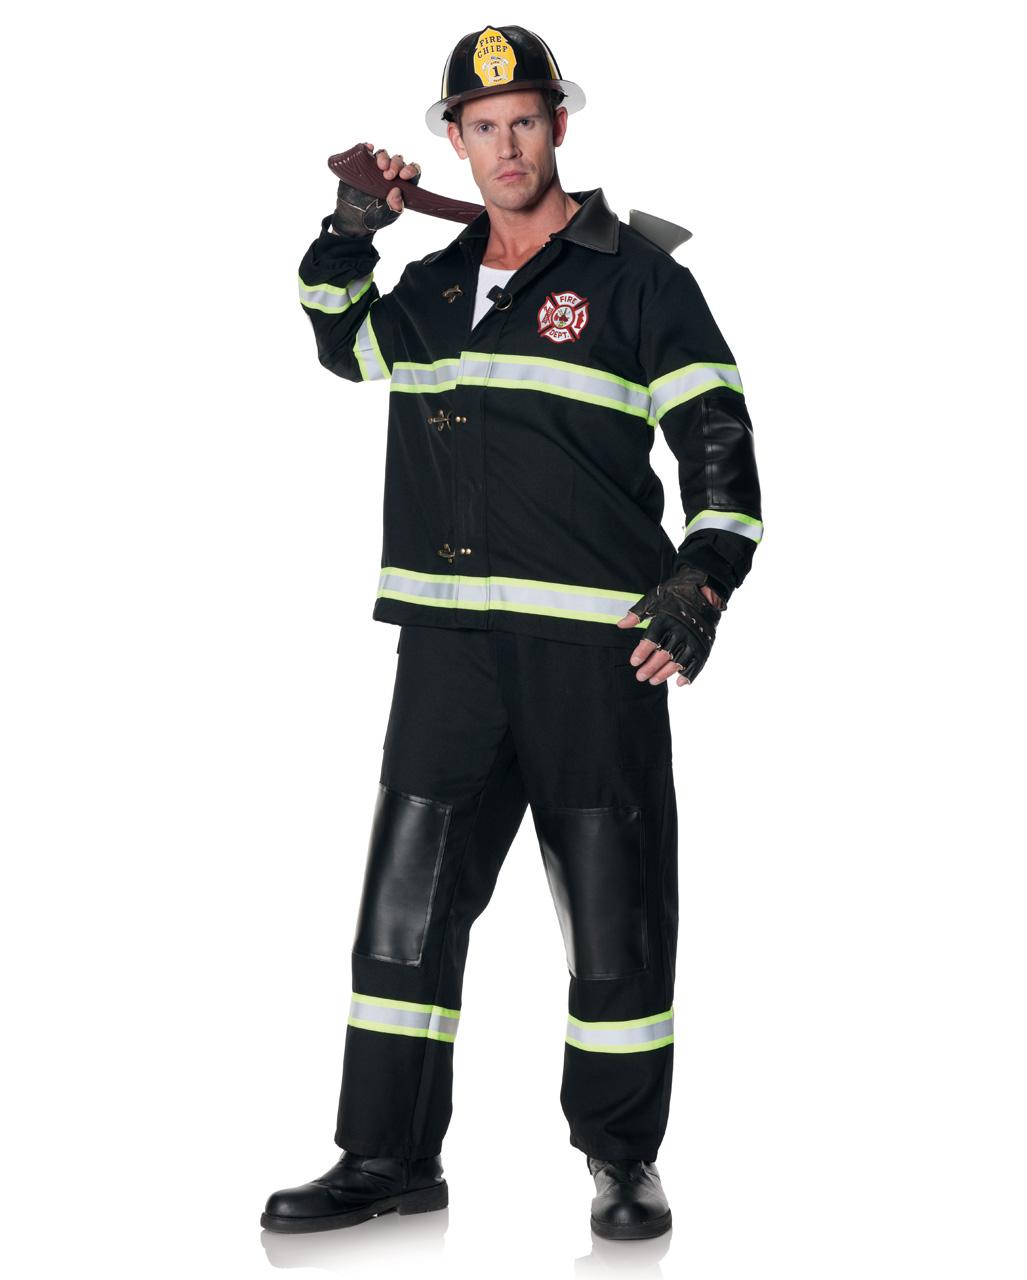 Details about  /Mr.Firefighter Fireman Emergency Services Uniform Mens Halloween Costume Sz XL